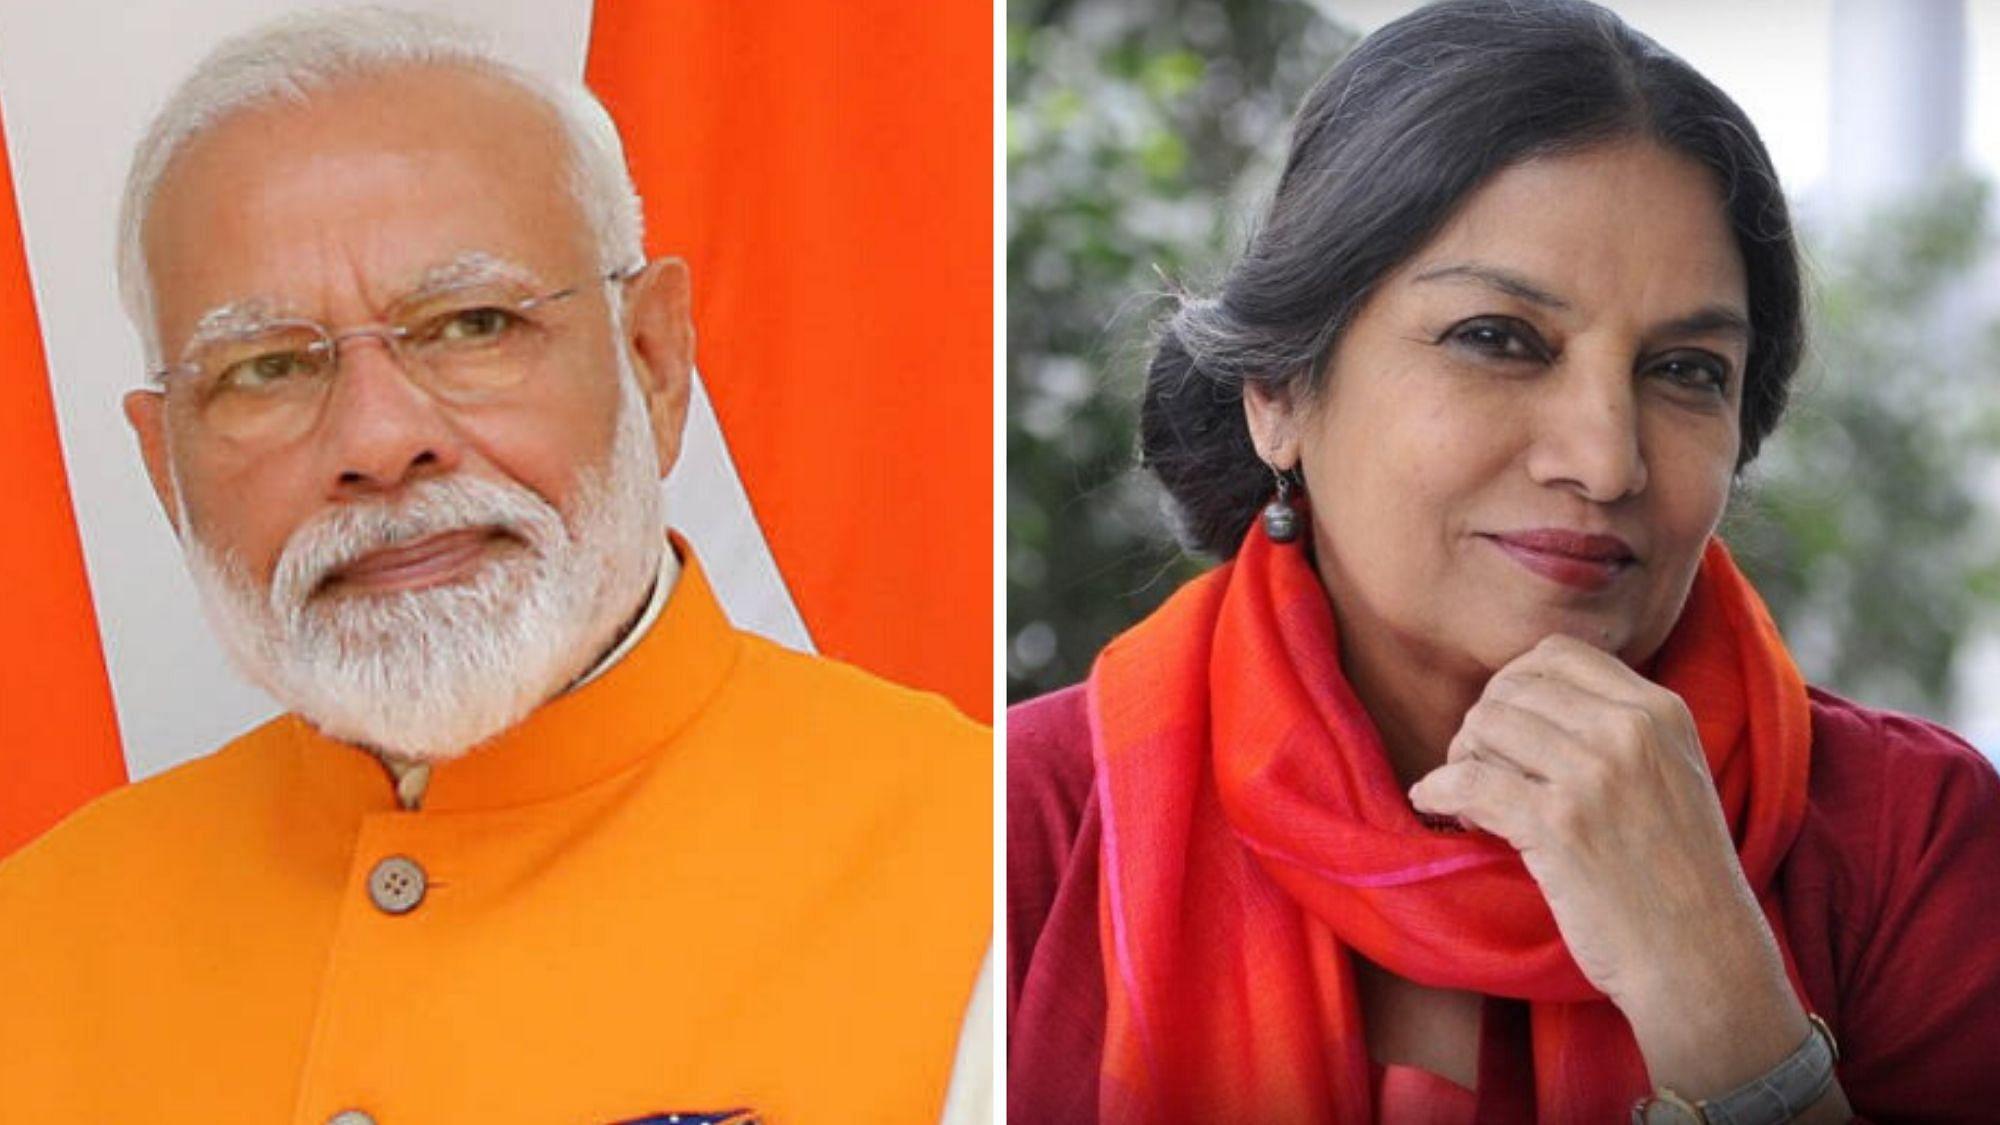 'Distressing': PM Modi After Shabana Azmi Injured in Car Accident